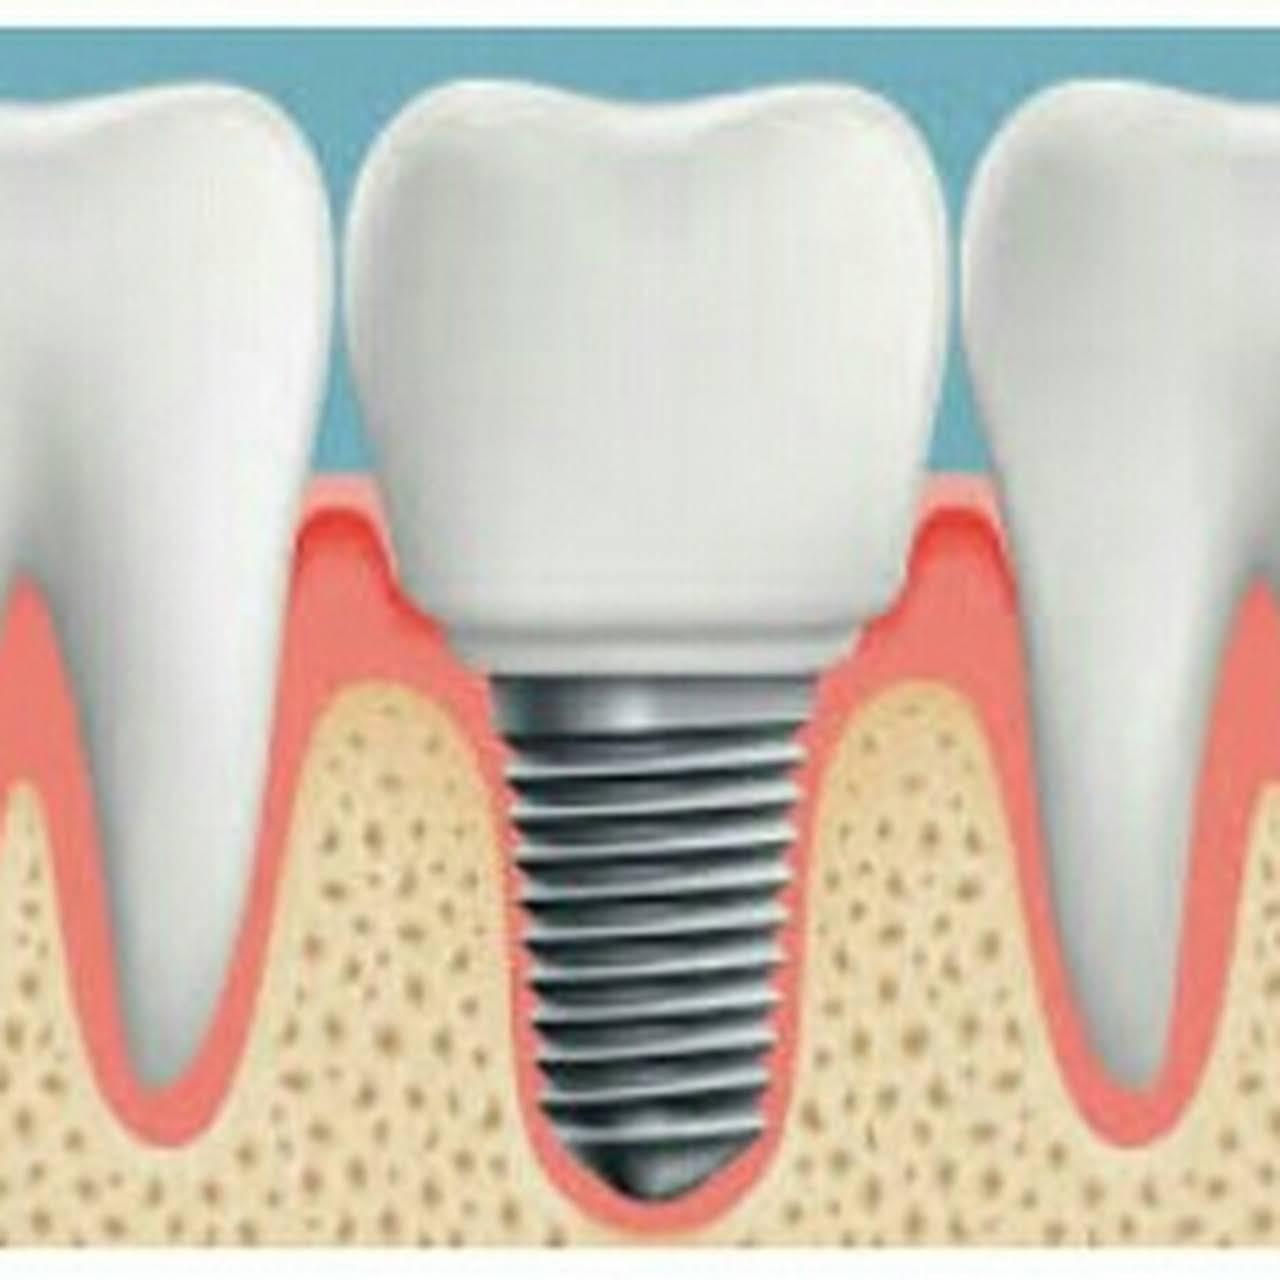 Dr. Desai's Multispeciality Dental Clinic & Implant Centre